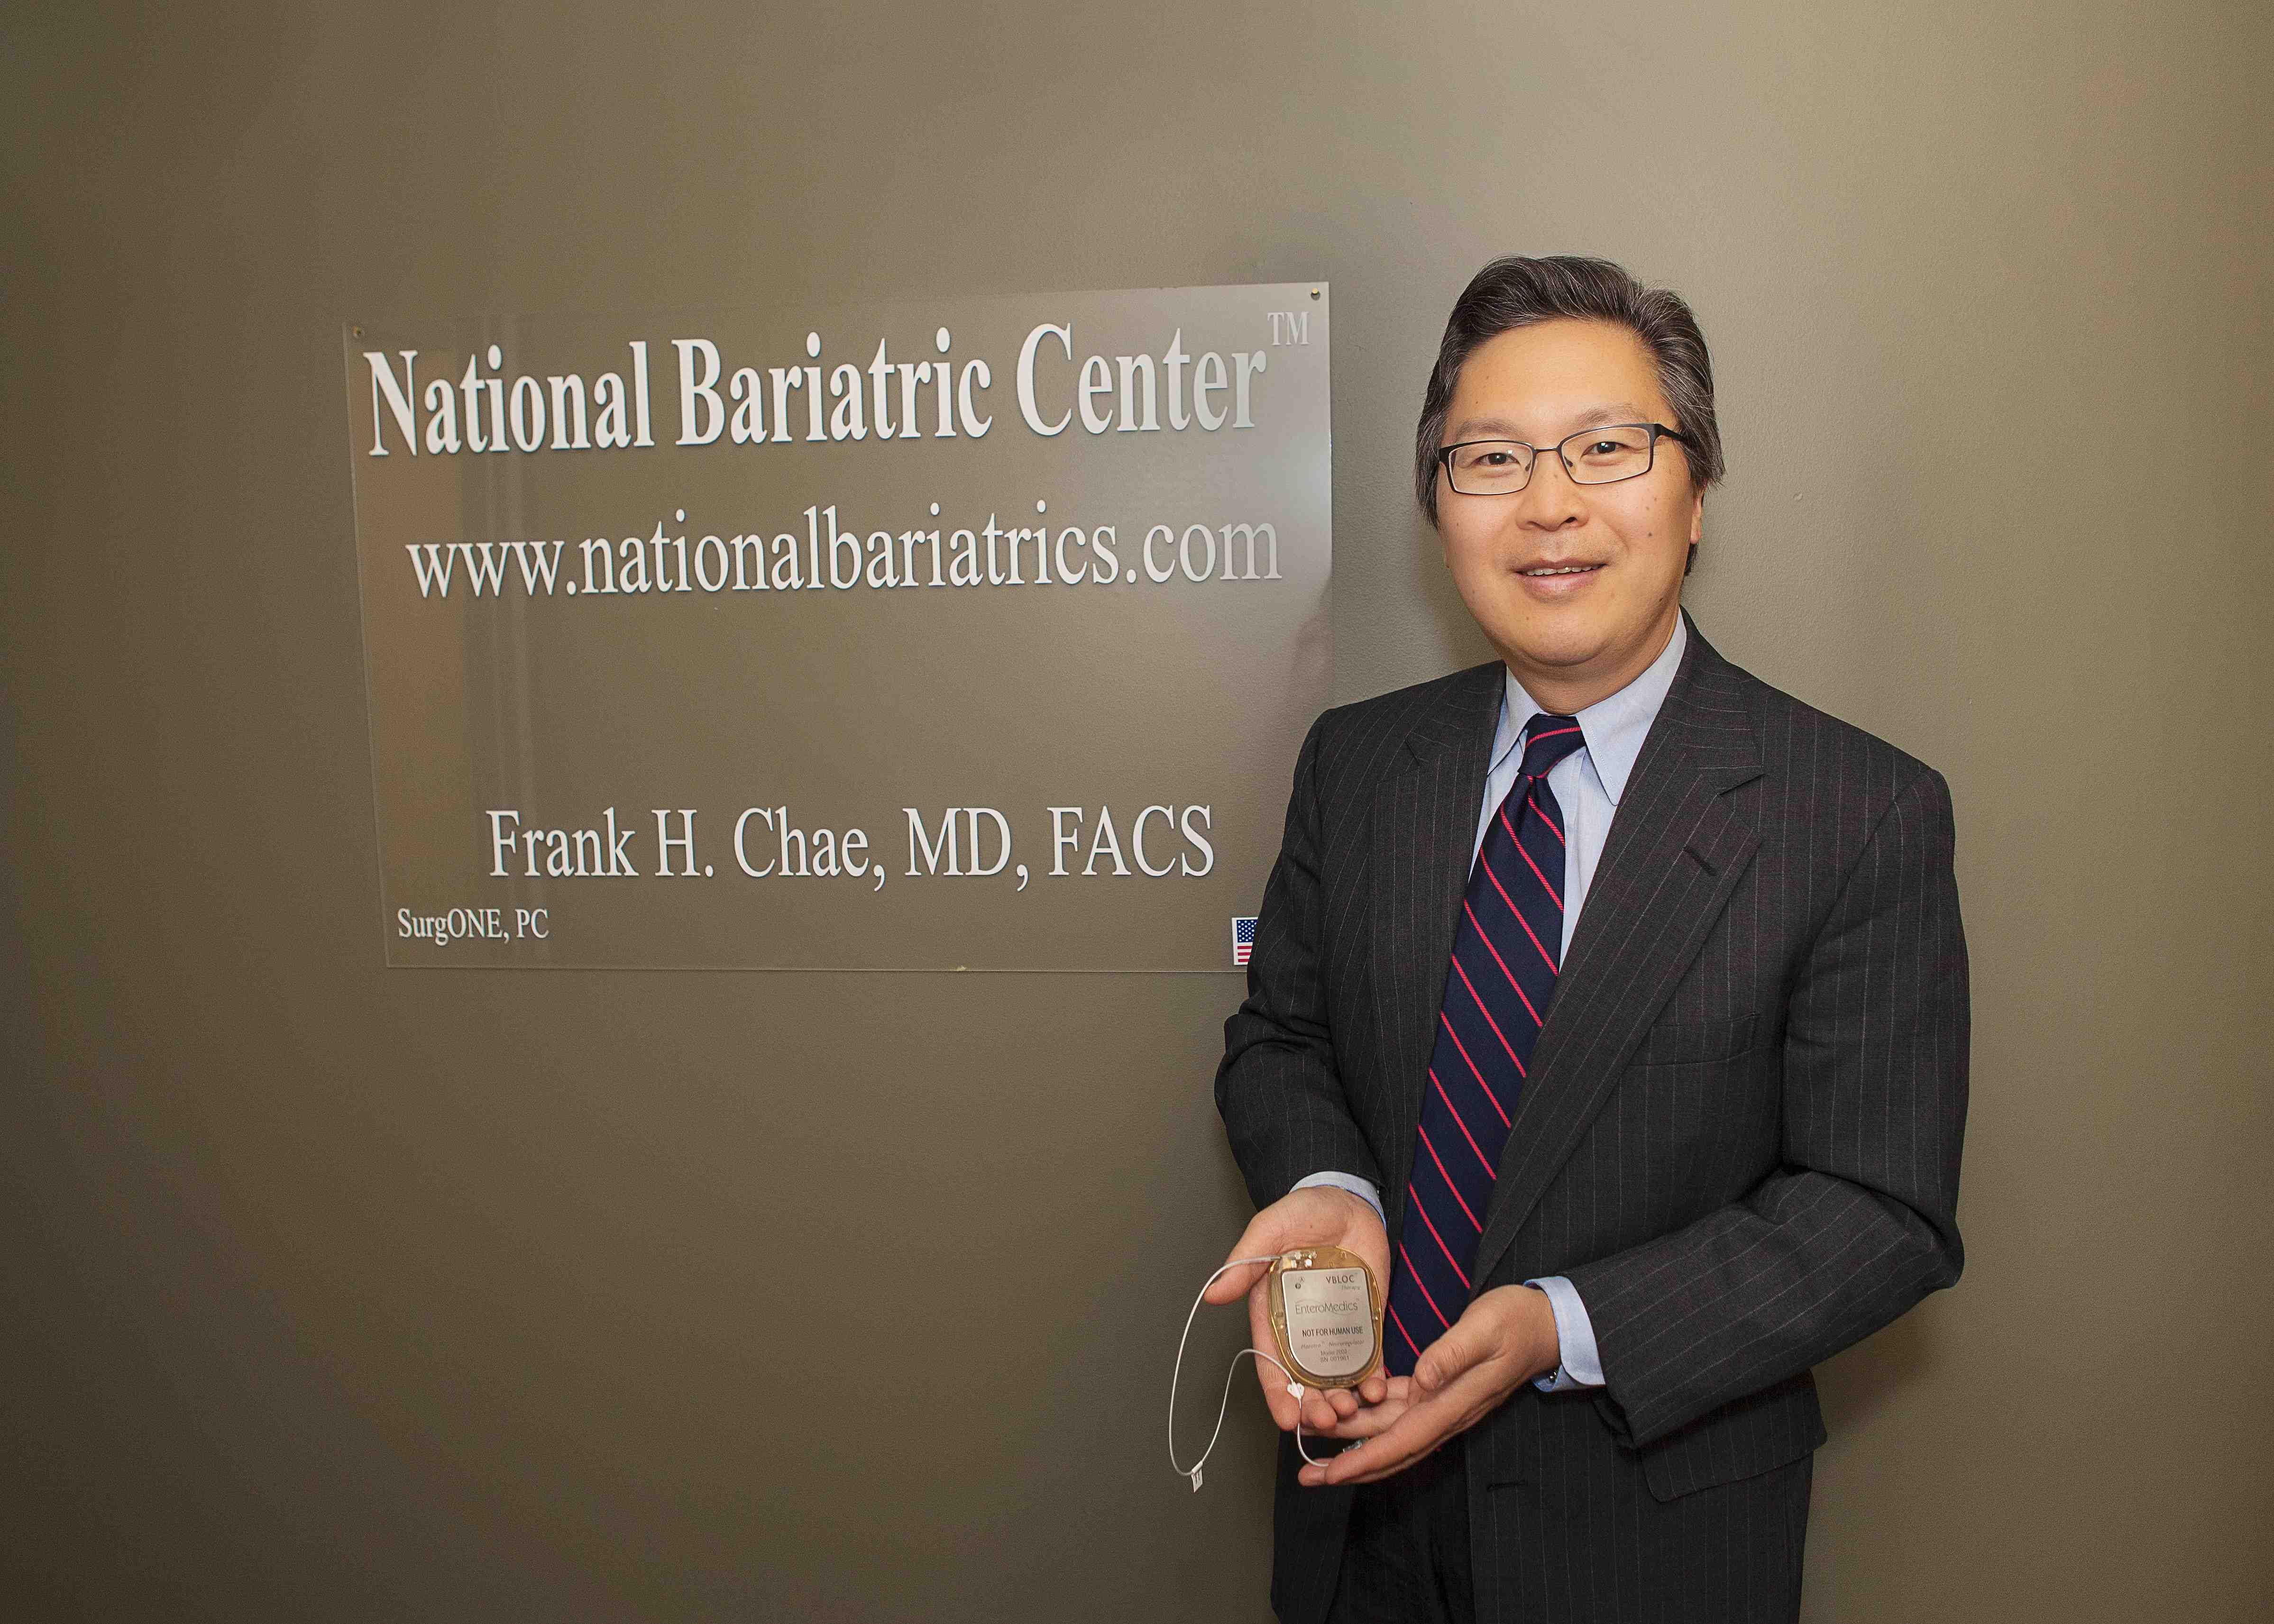 Dr. Frank Chae